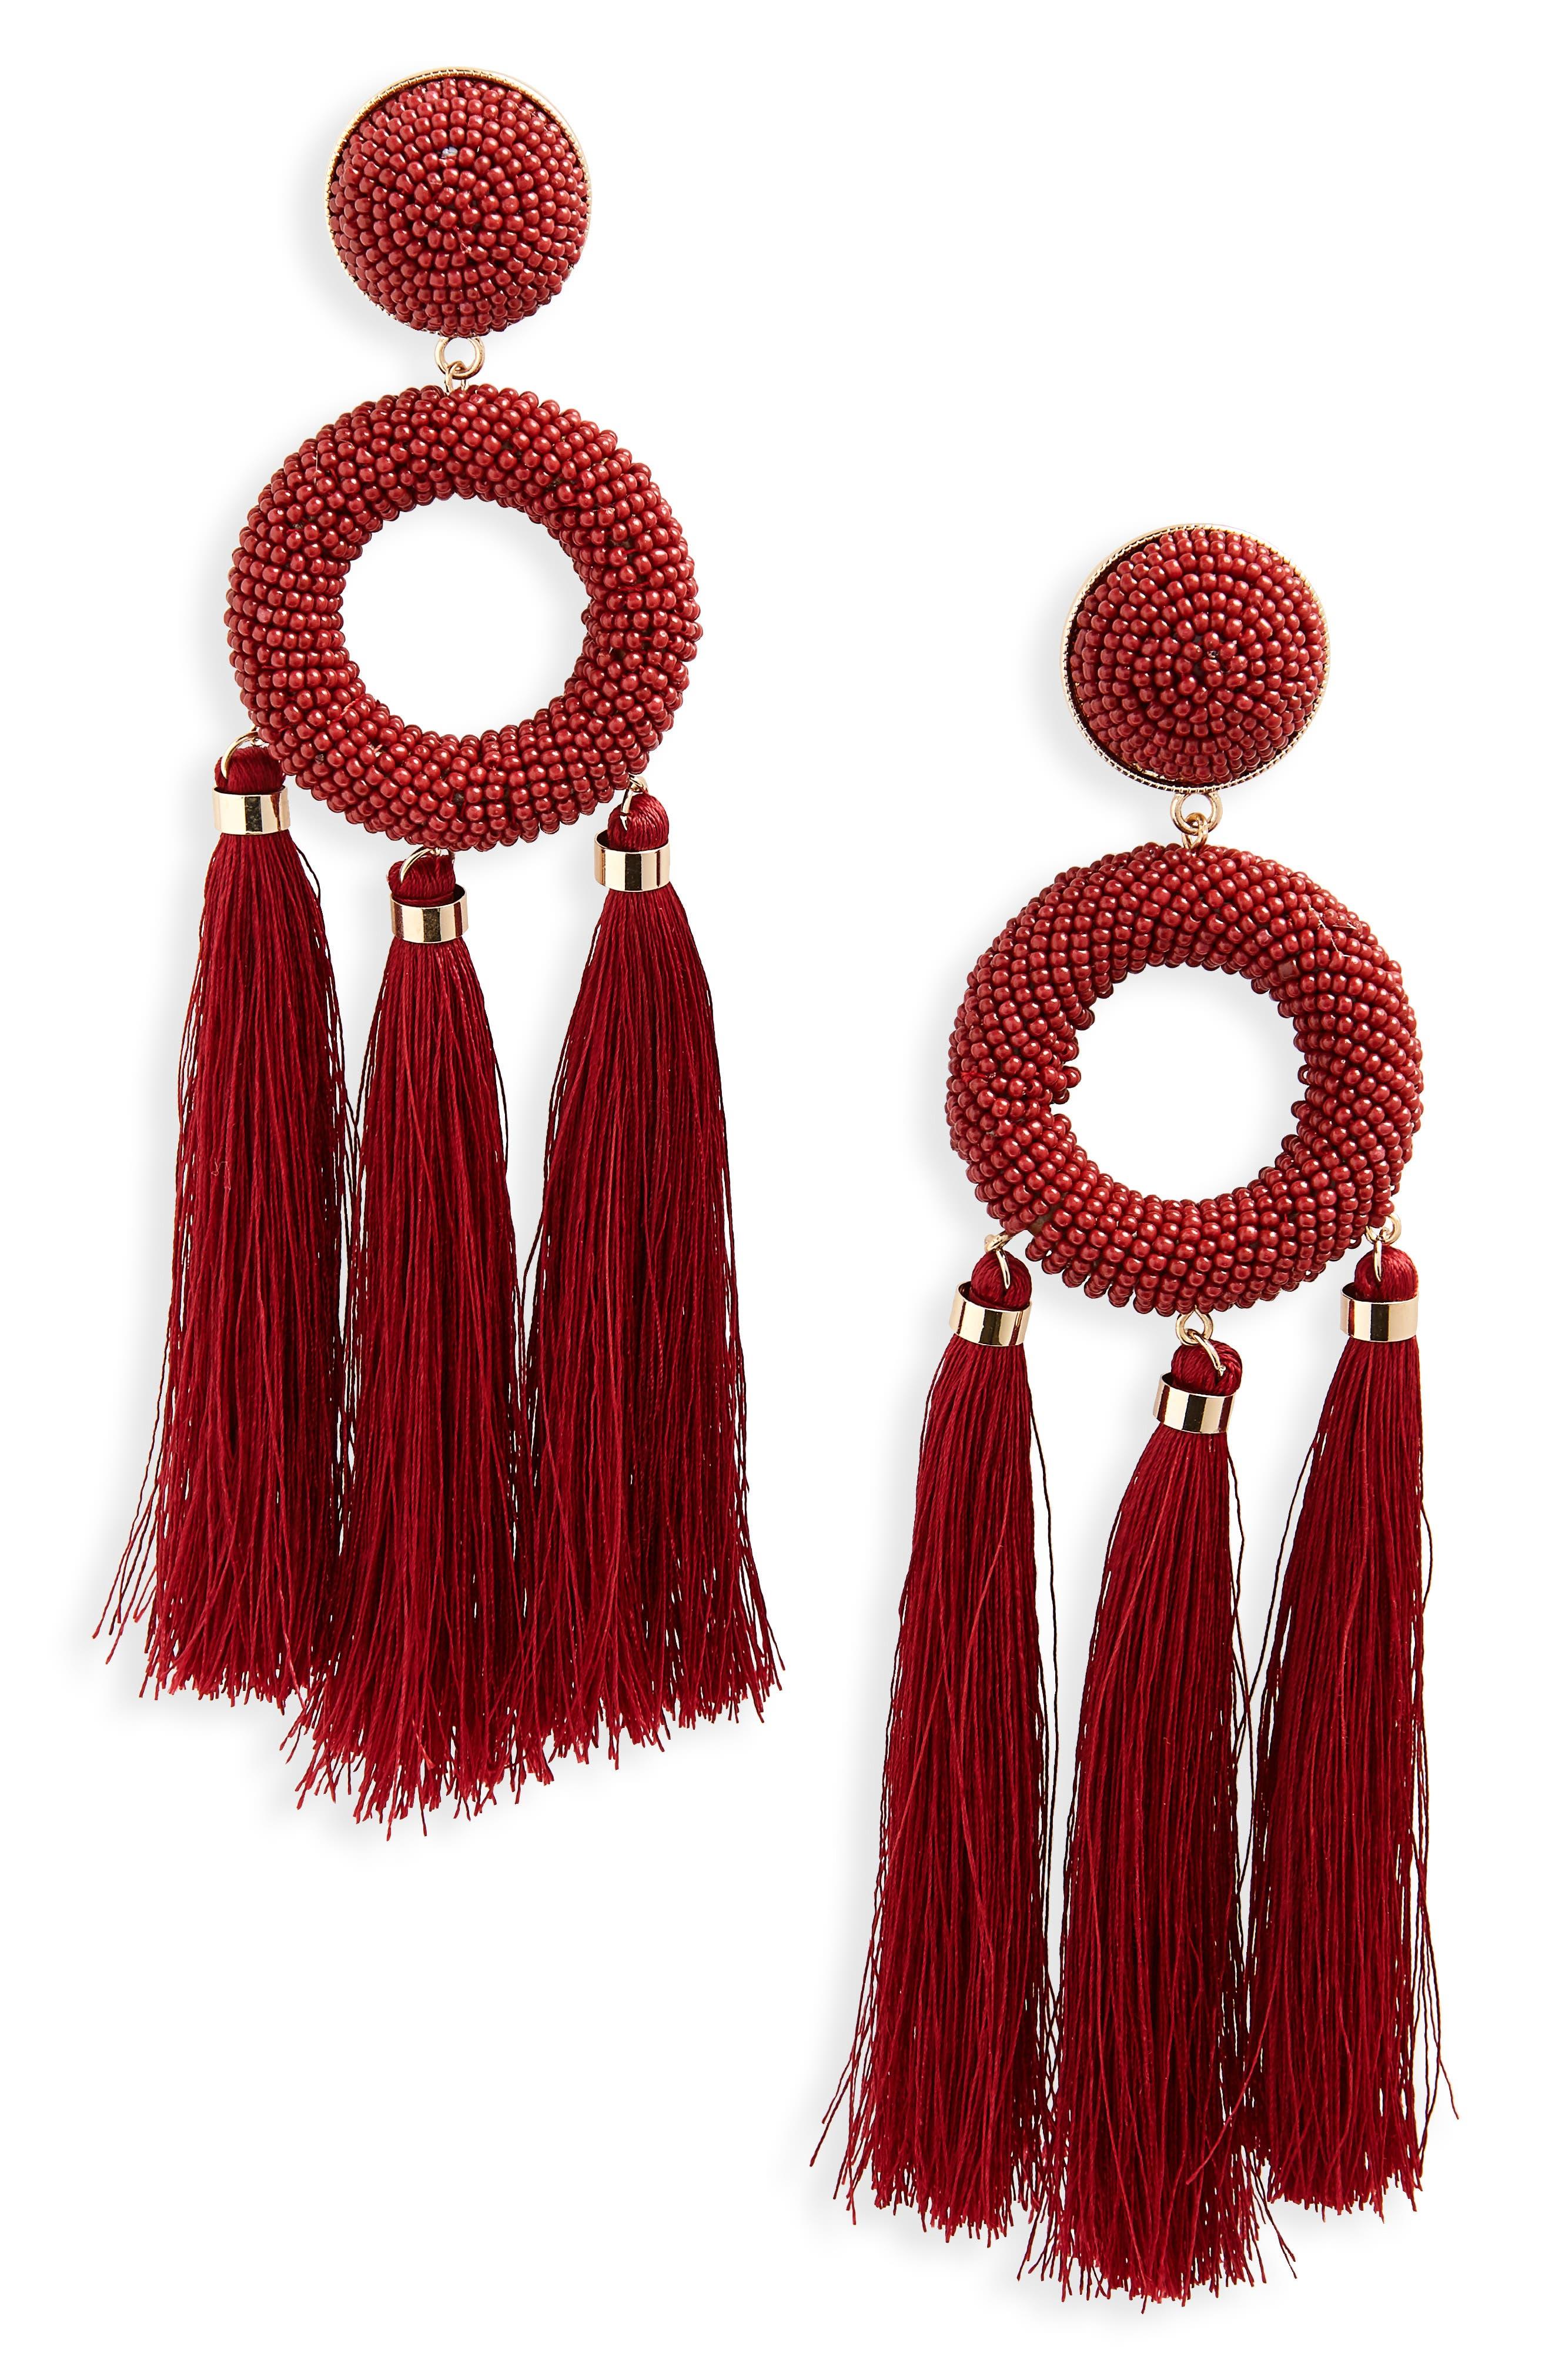 Seed Bead Tassel Earrings,                             Main thumbnail 1, color,                             Red